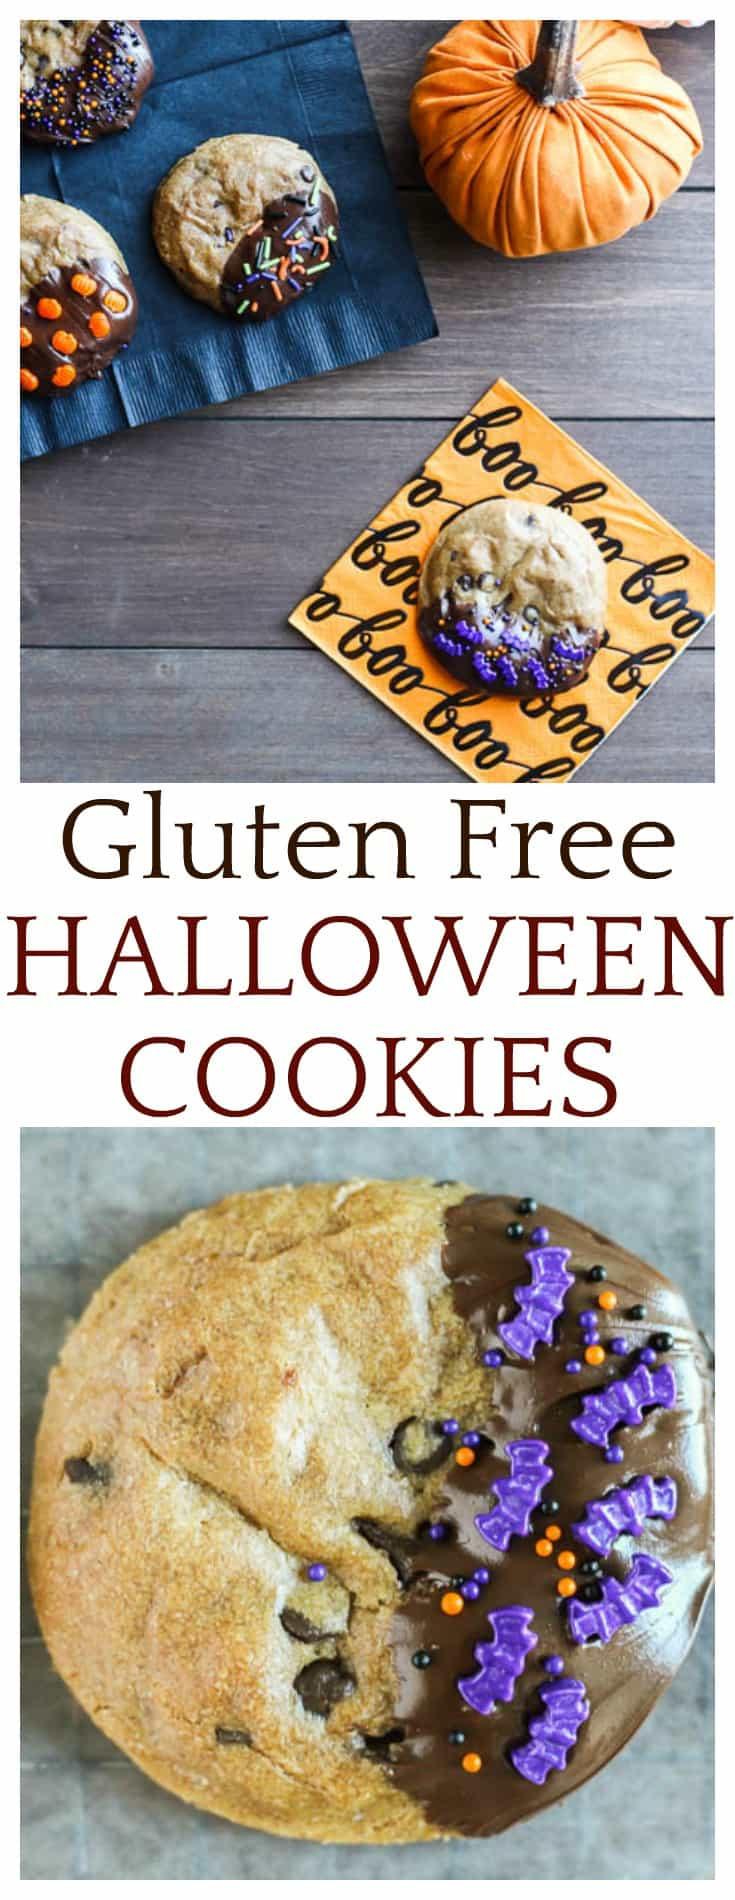 Gluten Free Halloween Cookies  Immaculate Gluten Free Halloween Cookies Delicious